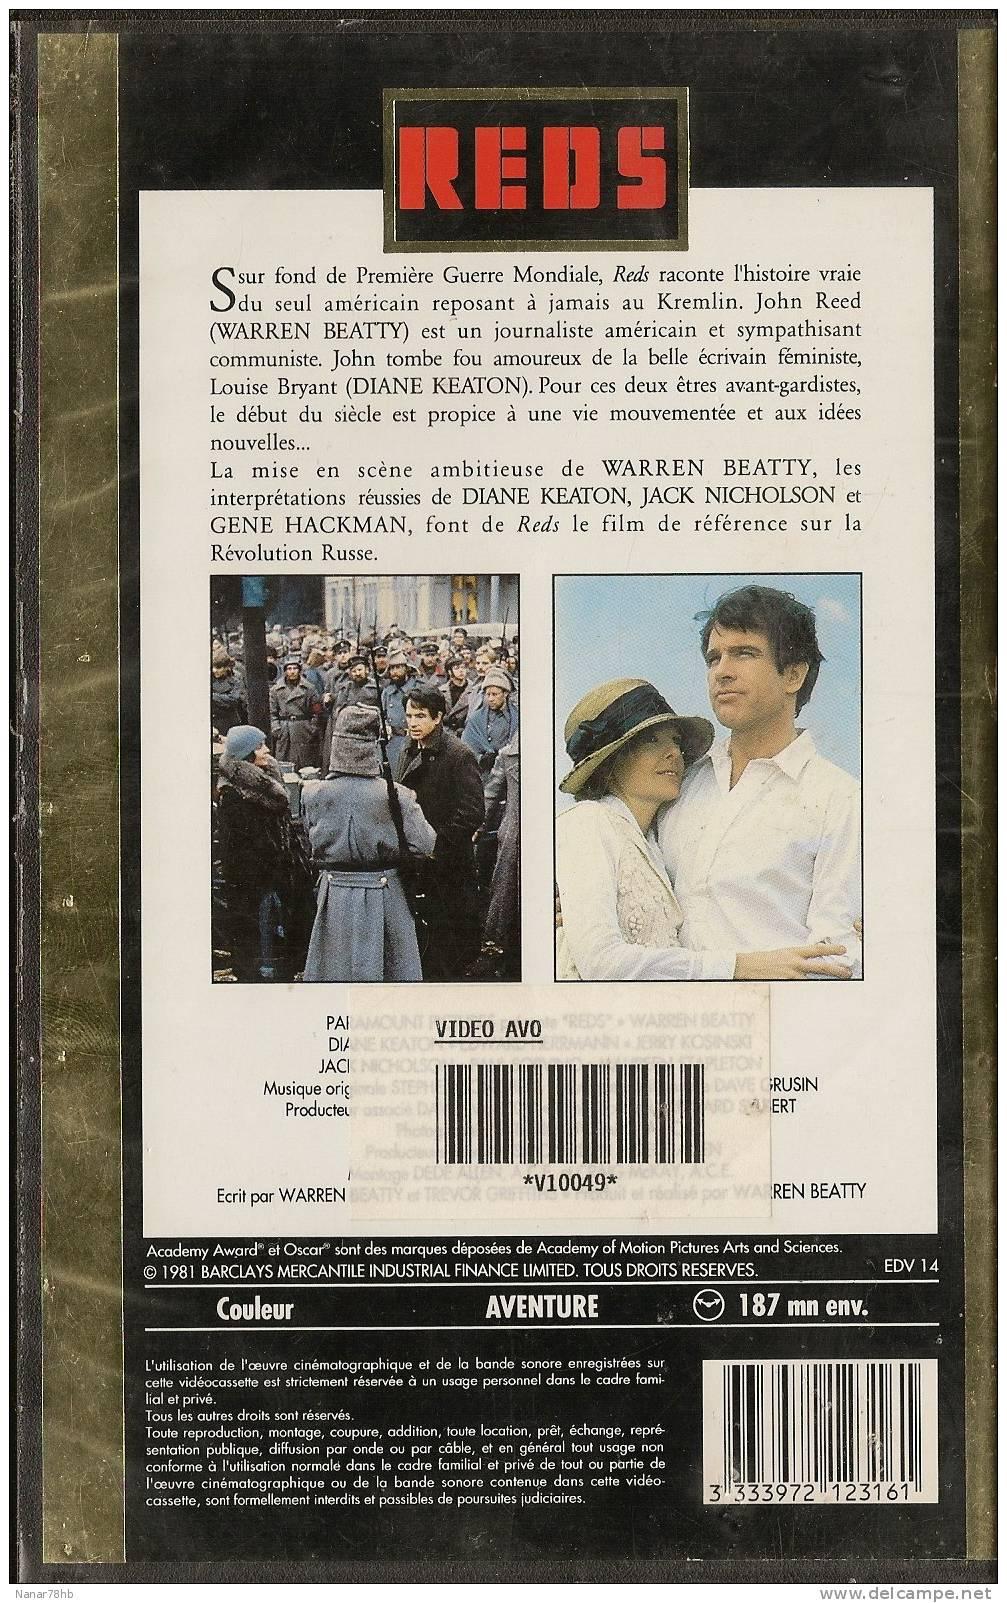 REDS De Warren Beatty Avec Warren Beatty, Diane Keaton, Jack Nicholson - Geschichte